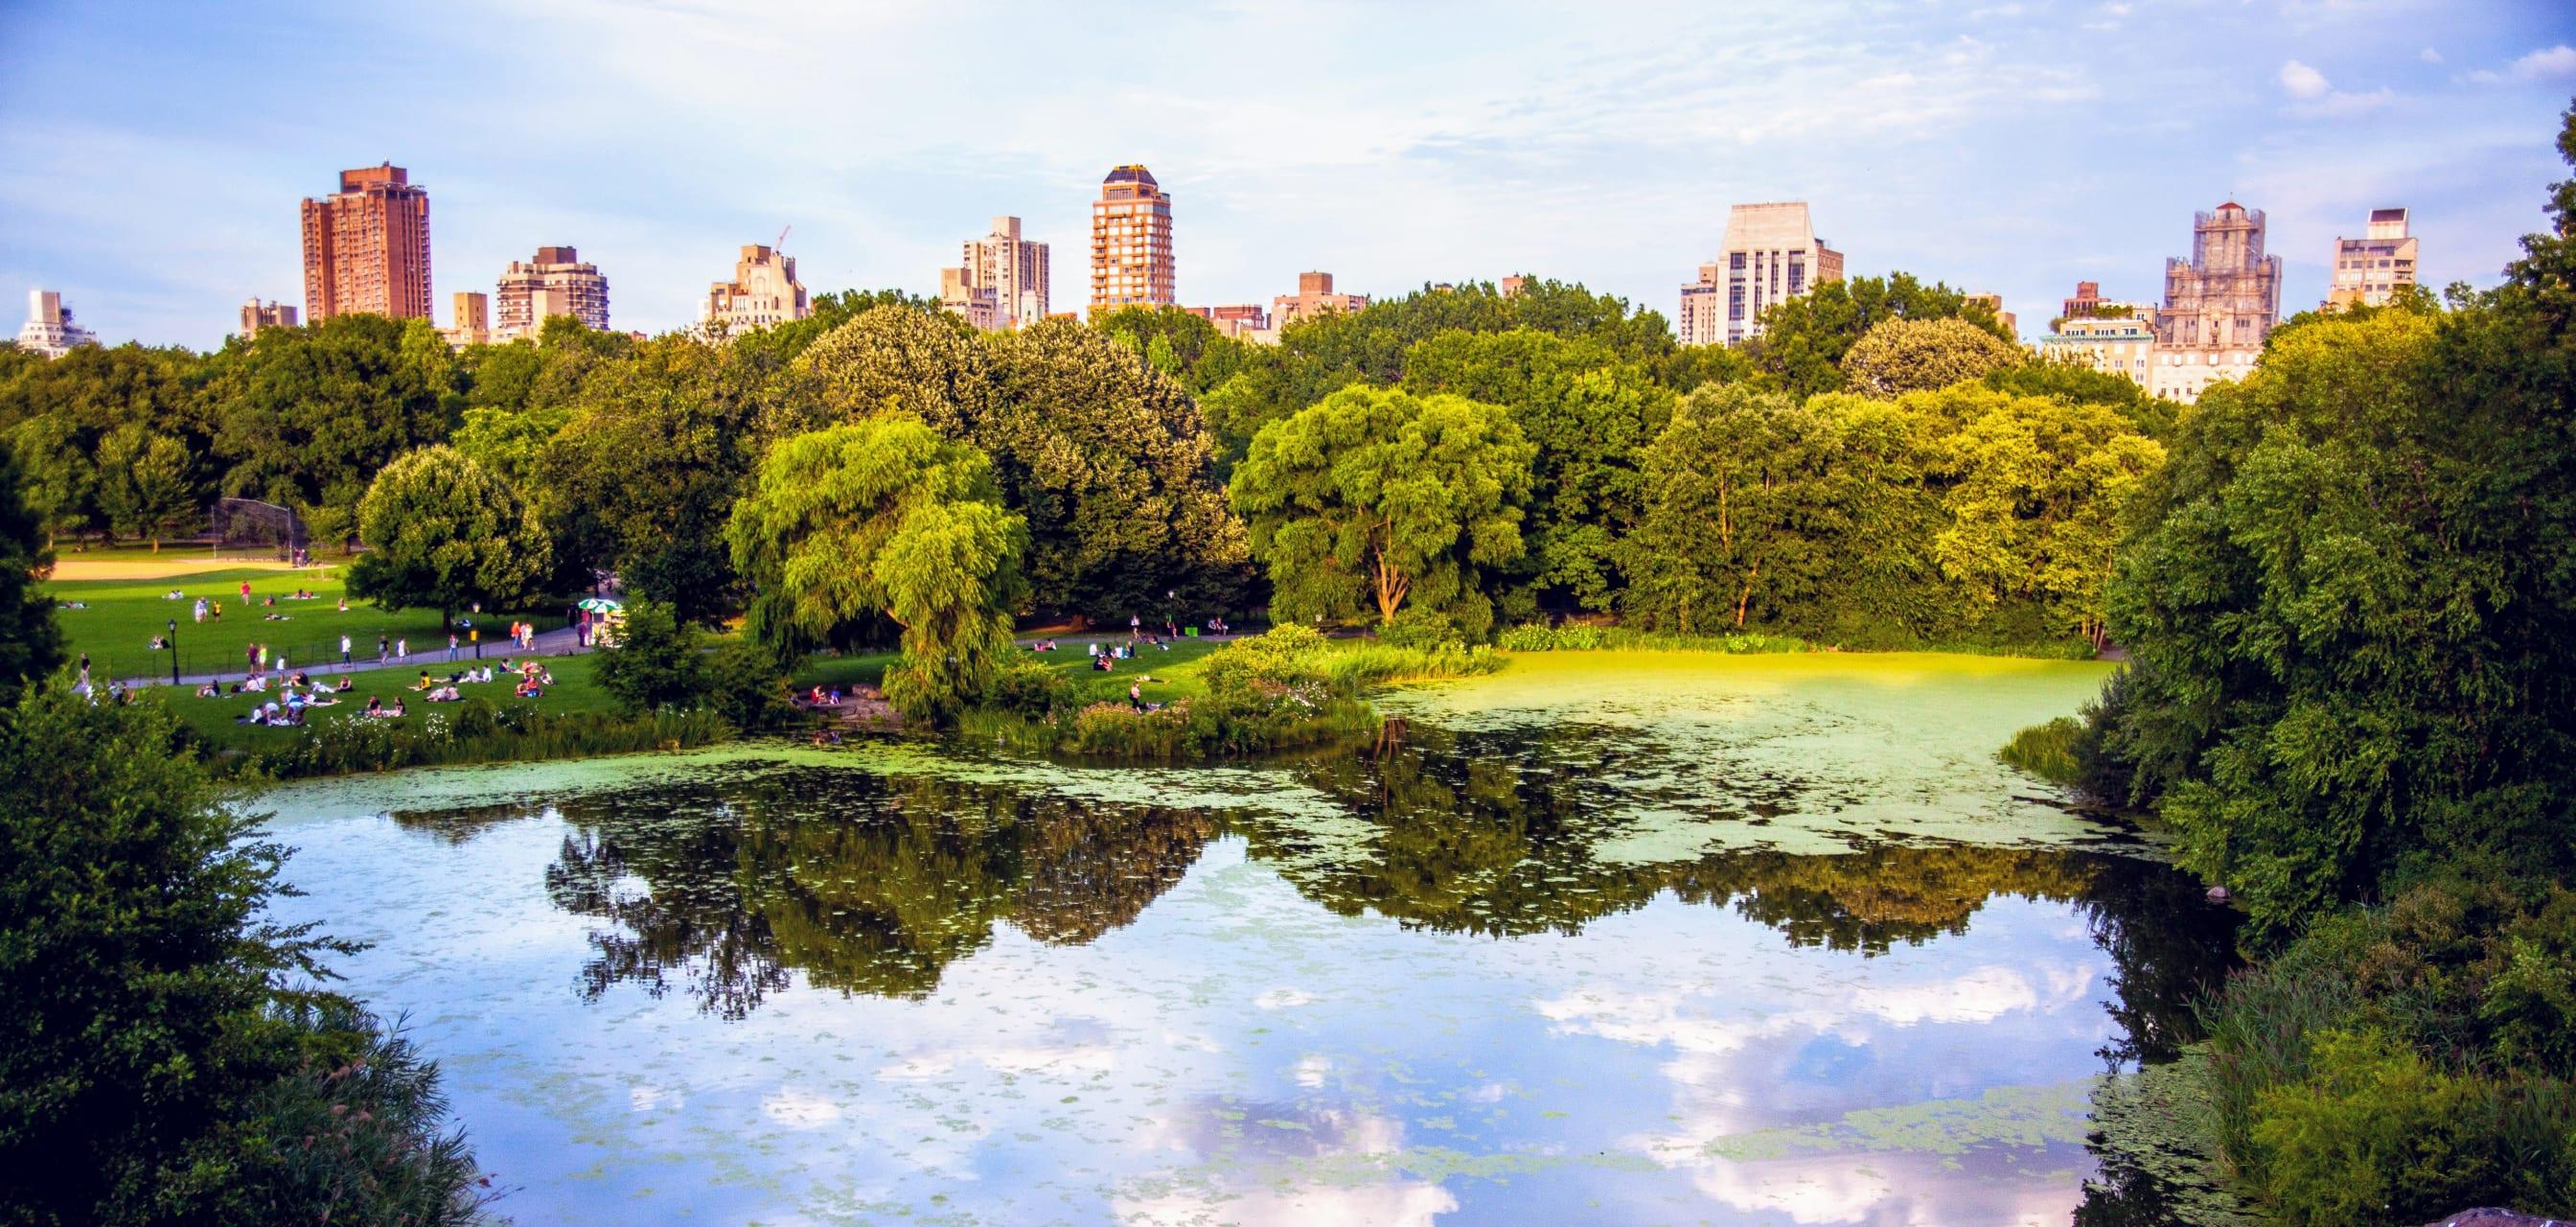 New York - New York City's Central Park: Bethesda Fountain, Bow Bridge and The Lake